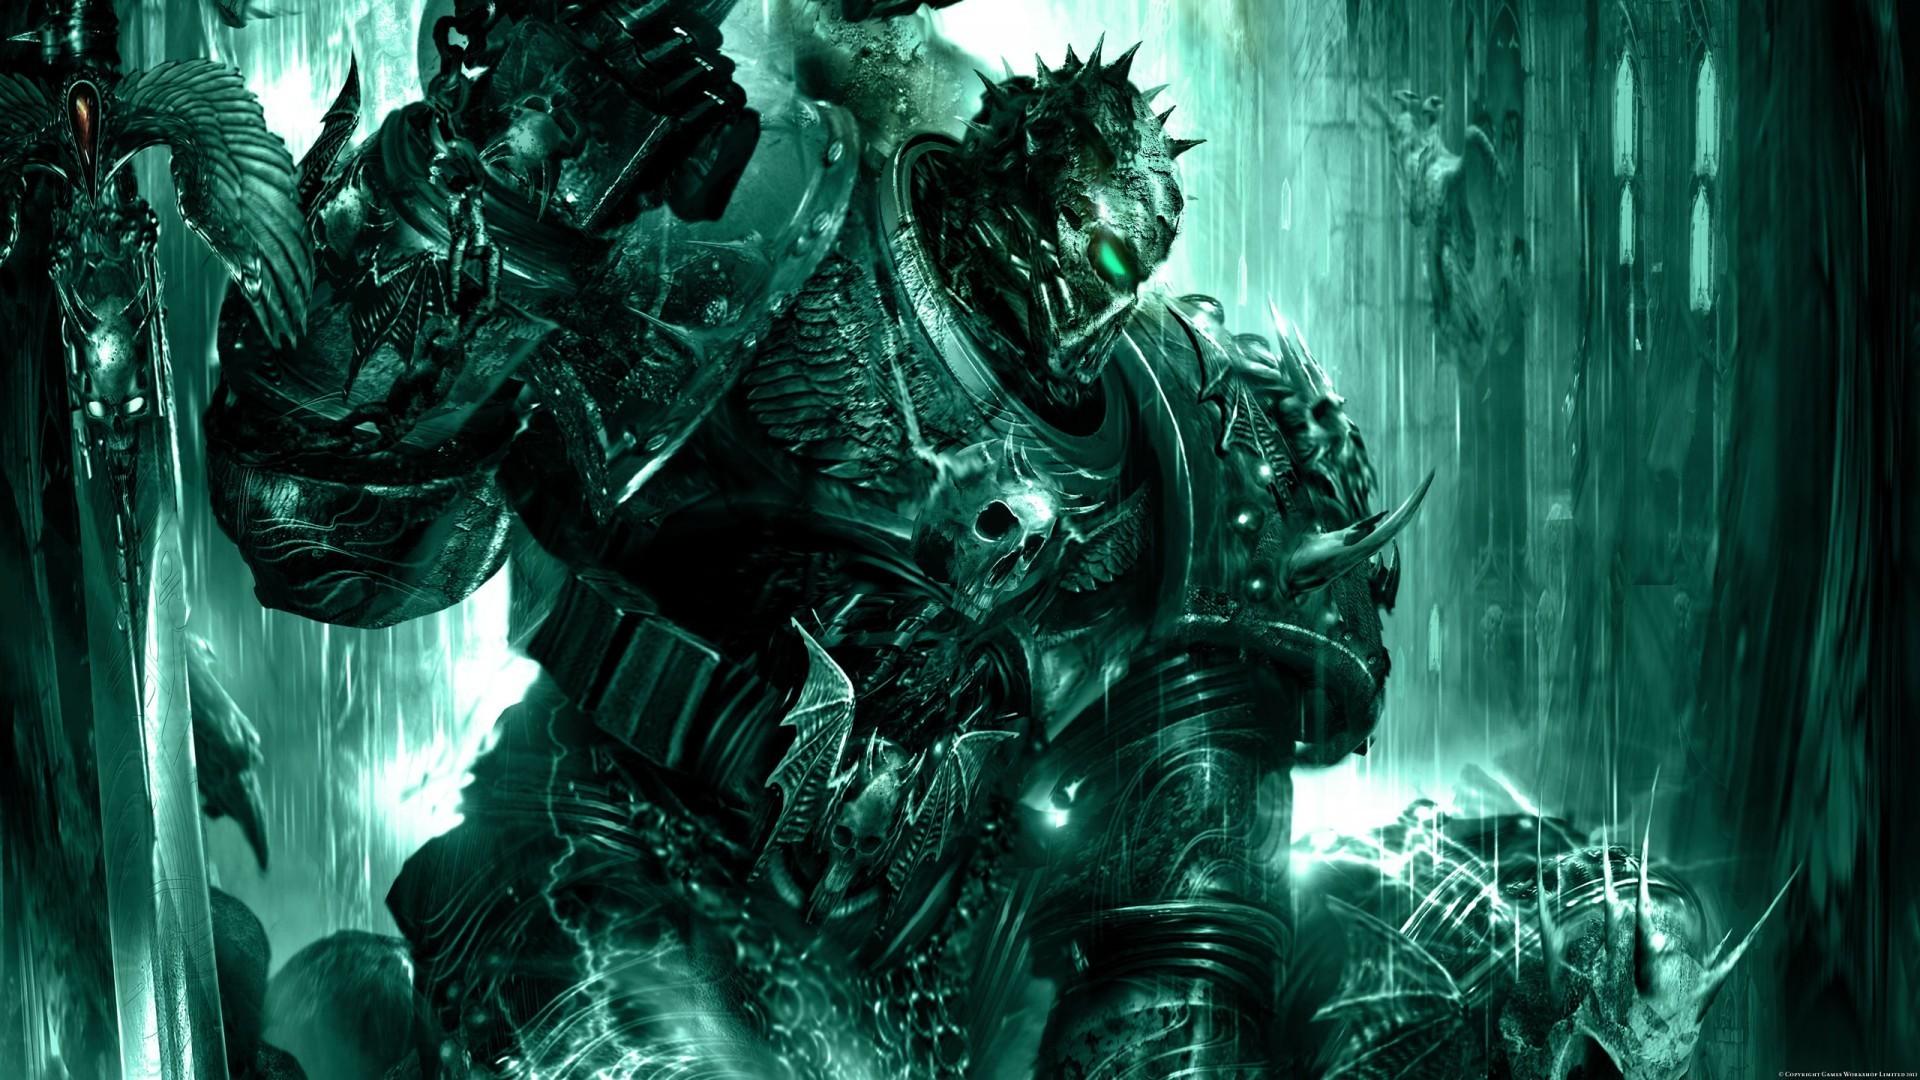 HD-wallpaper-Otife-Warhammer-40k-Fantasy-Art-Artwork-Chaos-Space-Marine -Soul-Hunter-Talos-Hd-Wallpaper-.jpg